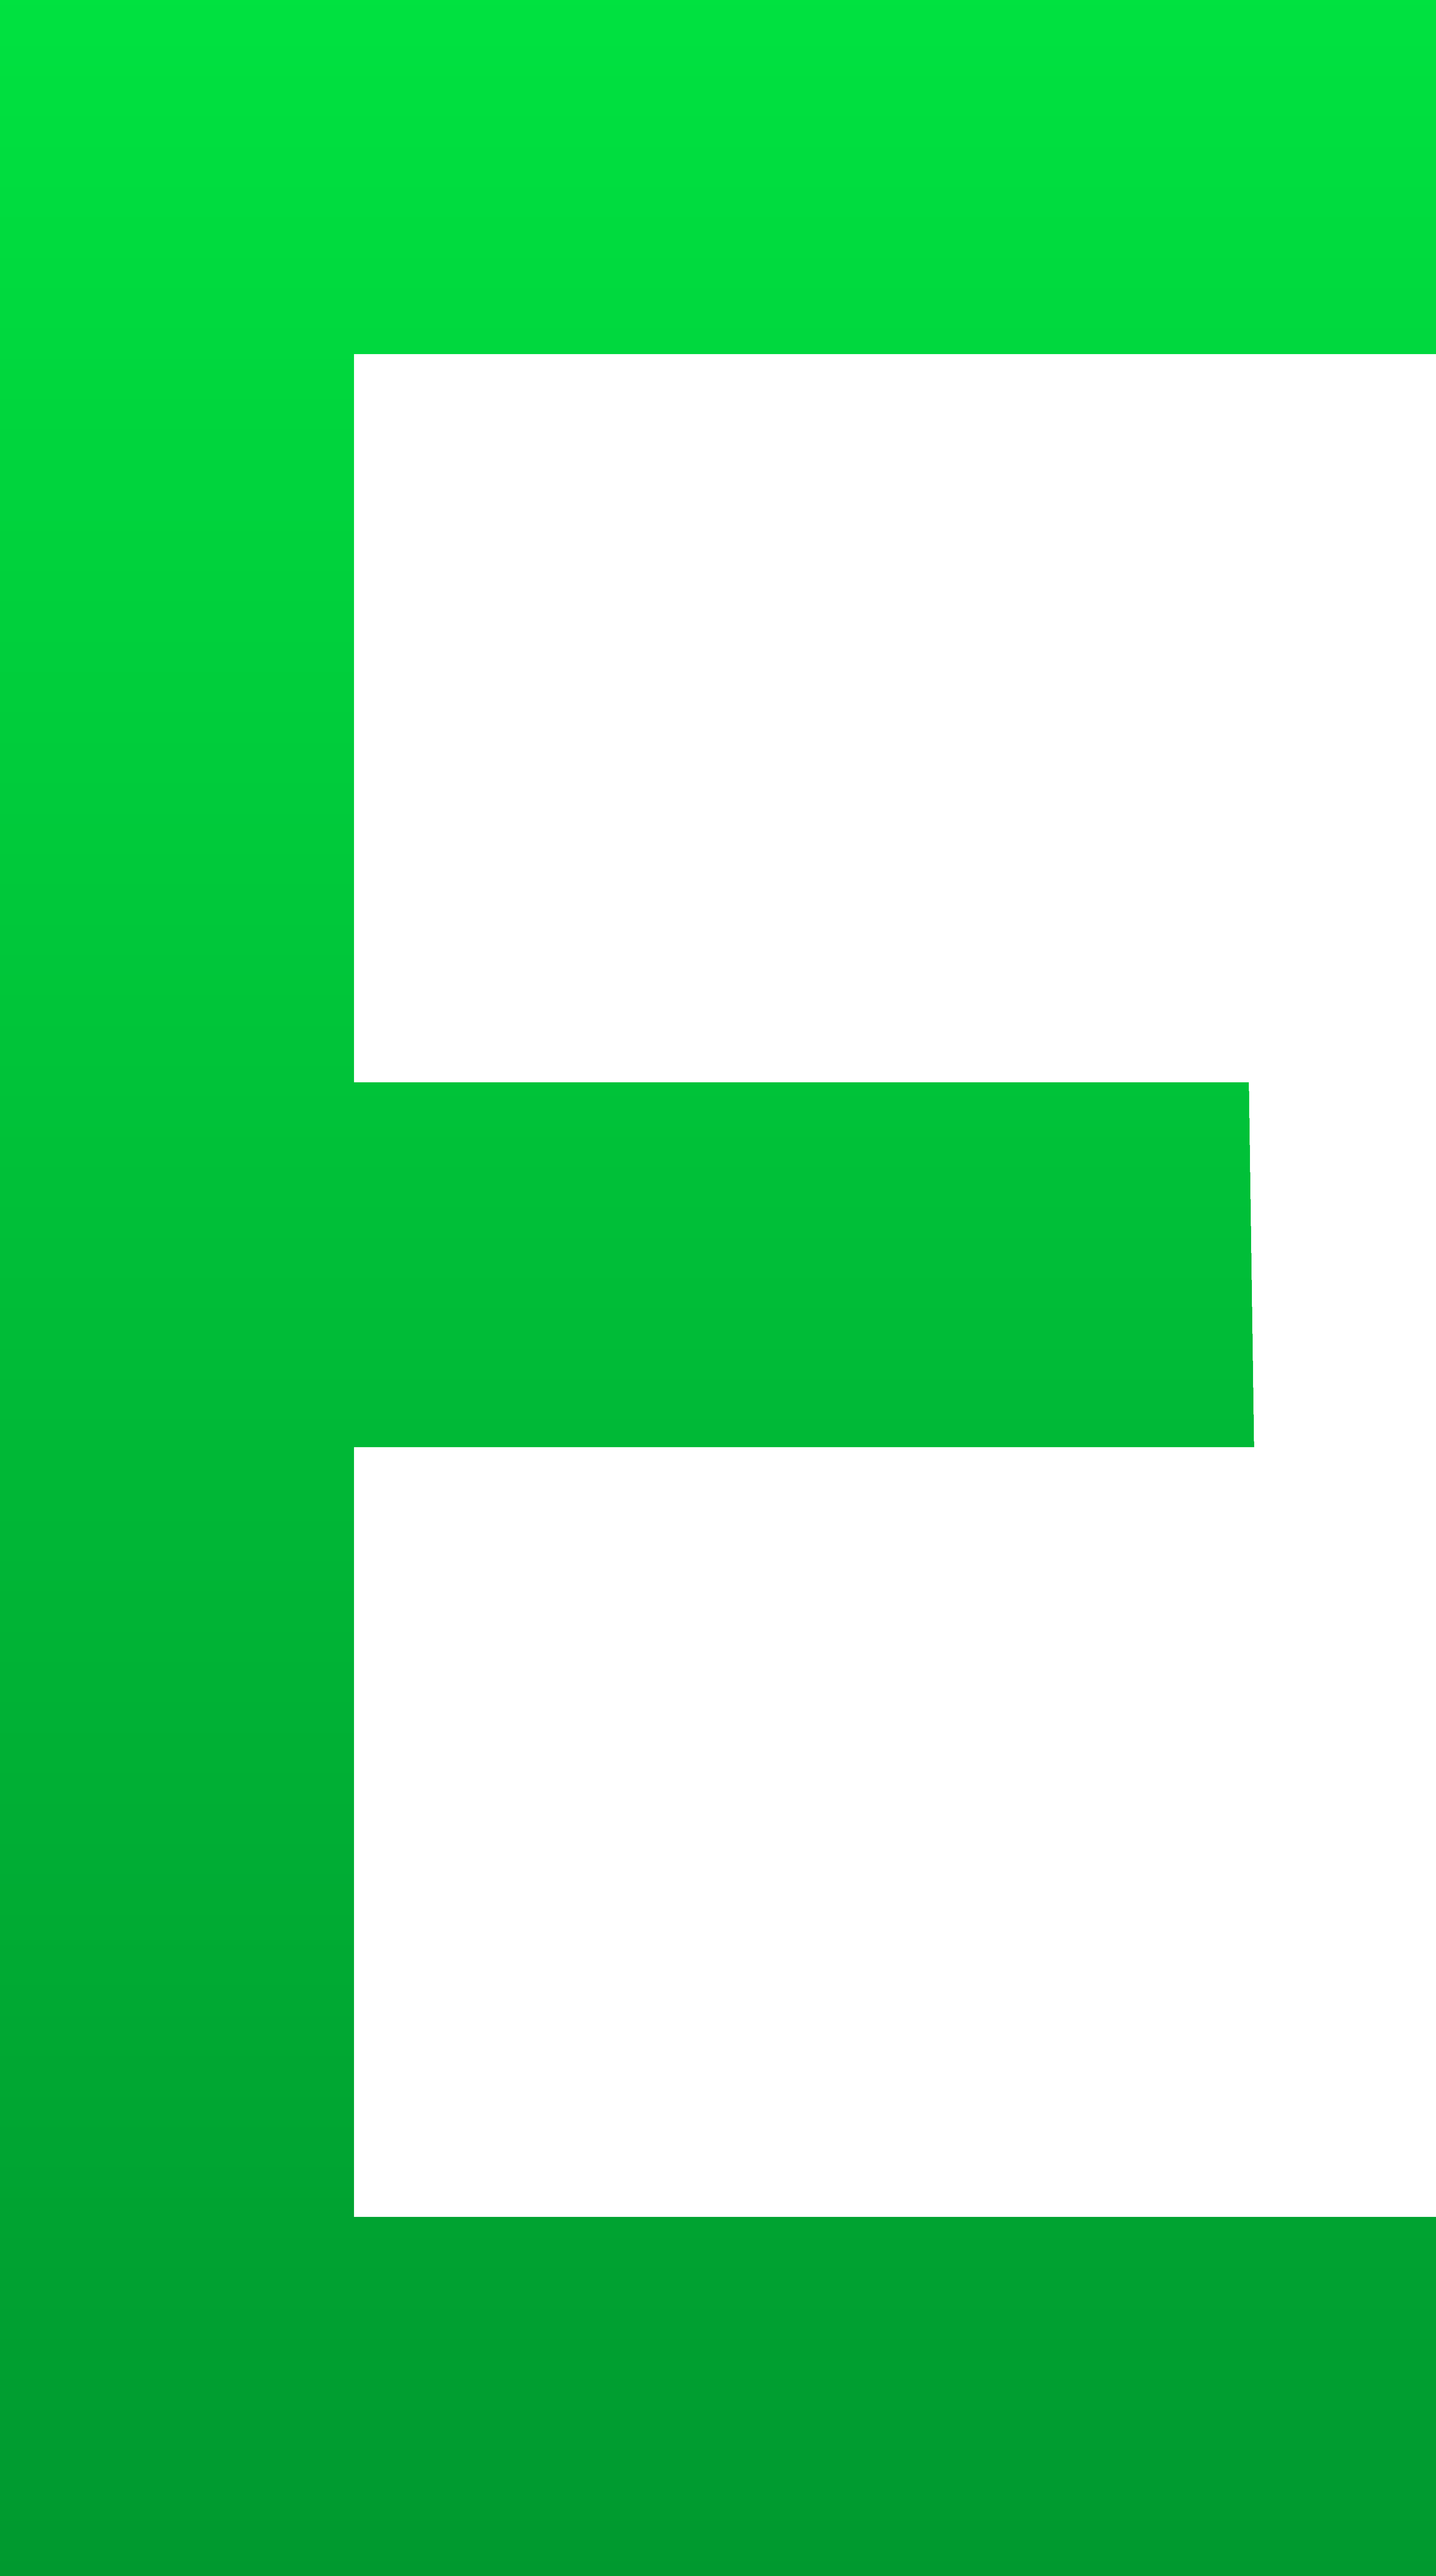 png transparent E clipart. The letter free clip